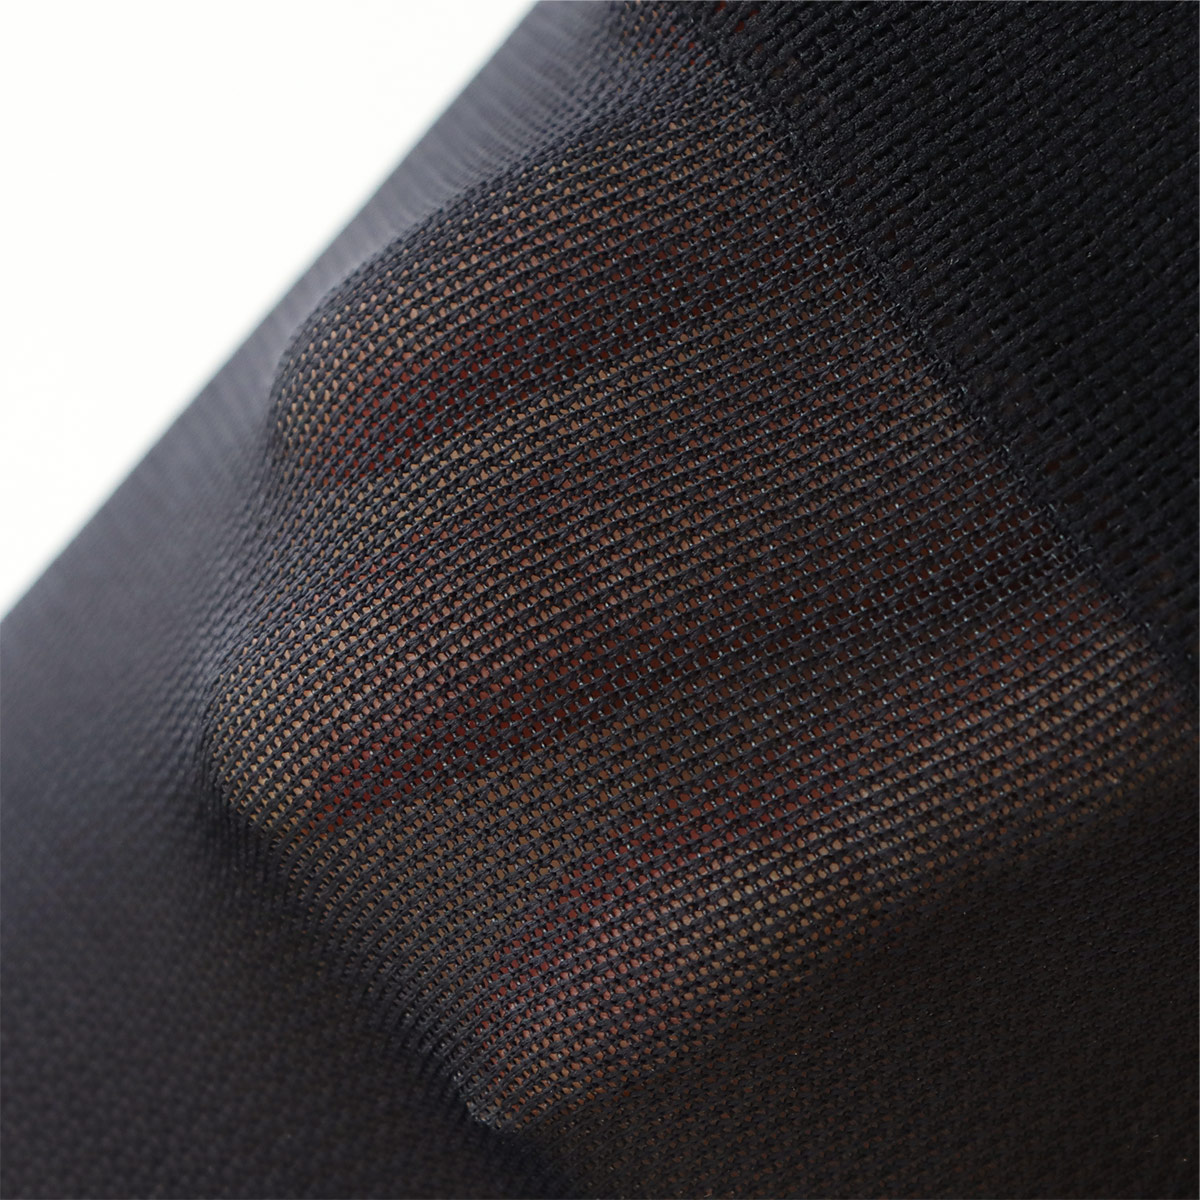 NAIGAI COMFORT ナイガイ コンフォート 一般医療機器 コンプレッション ハイソックス ソフトタイプ 女性用 着圧 靴下 ソックス  女性 レディース 03070500【ゆうパケット・3点まで】